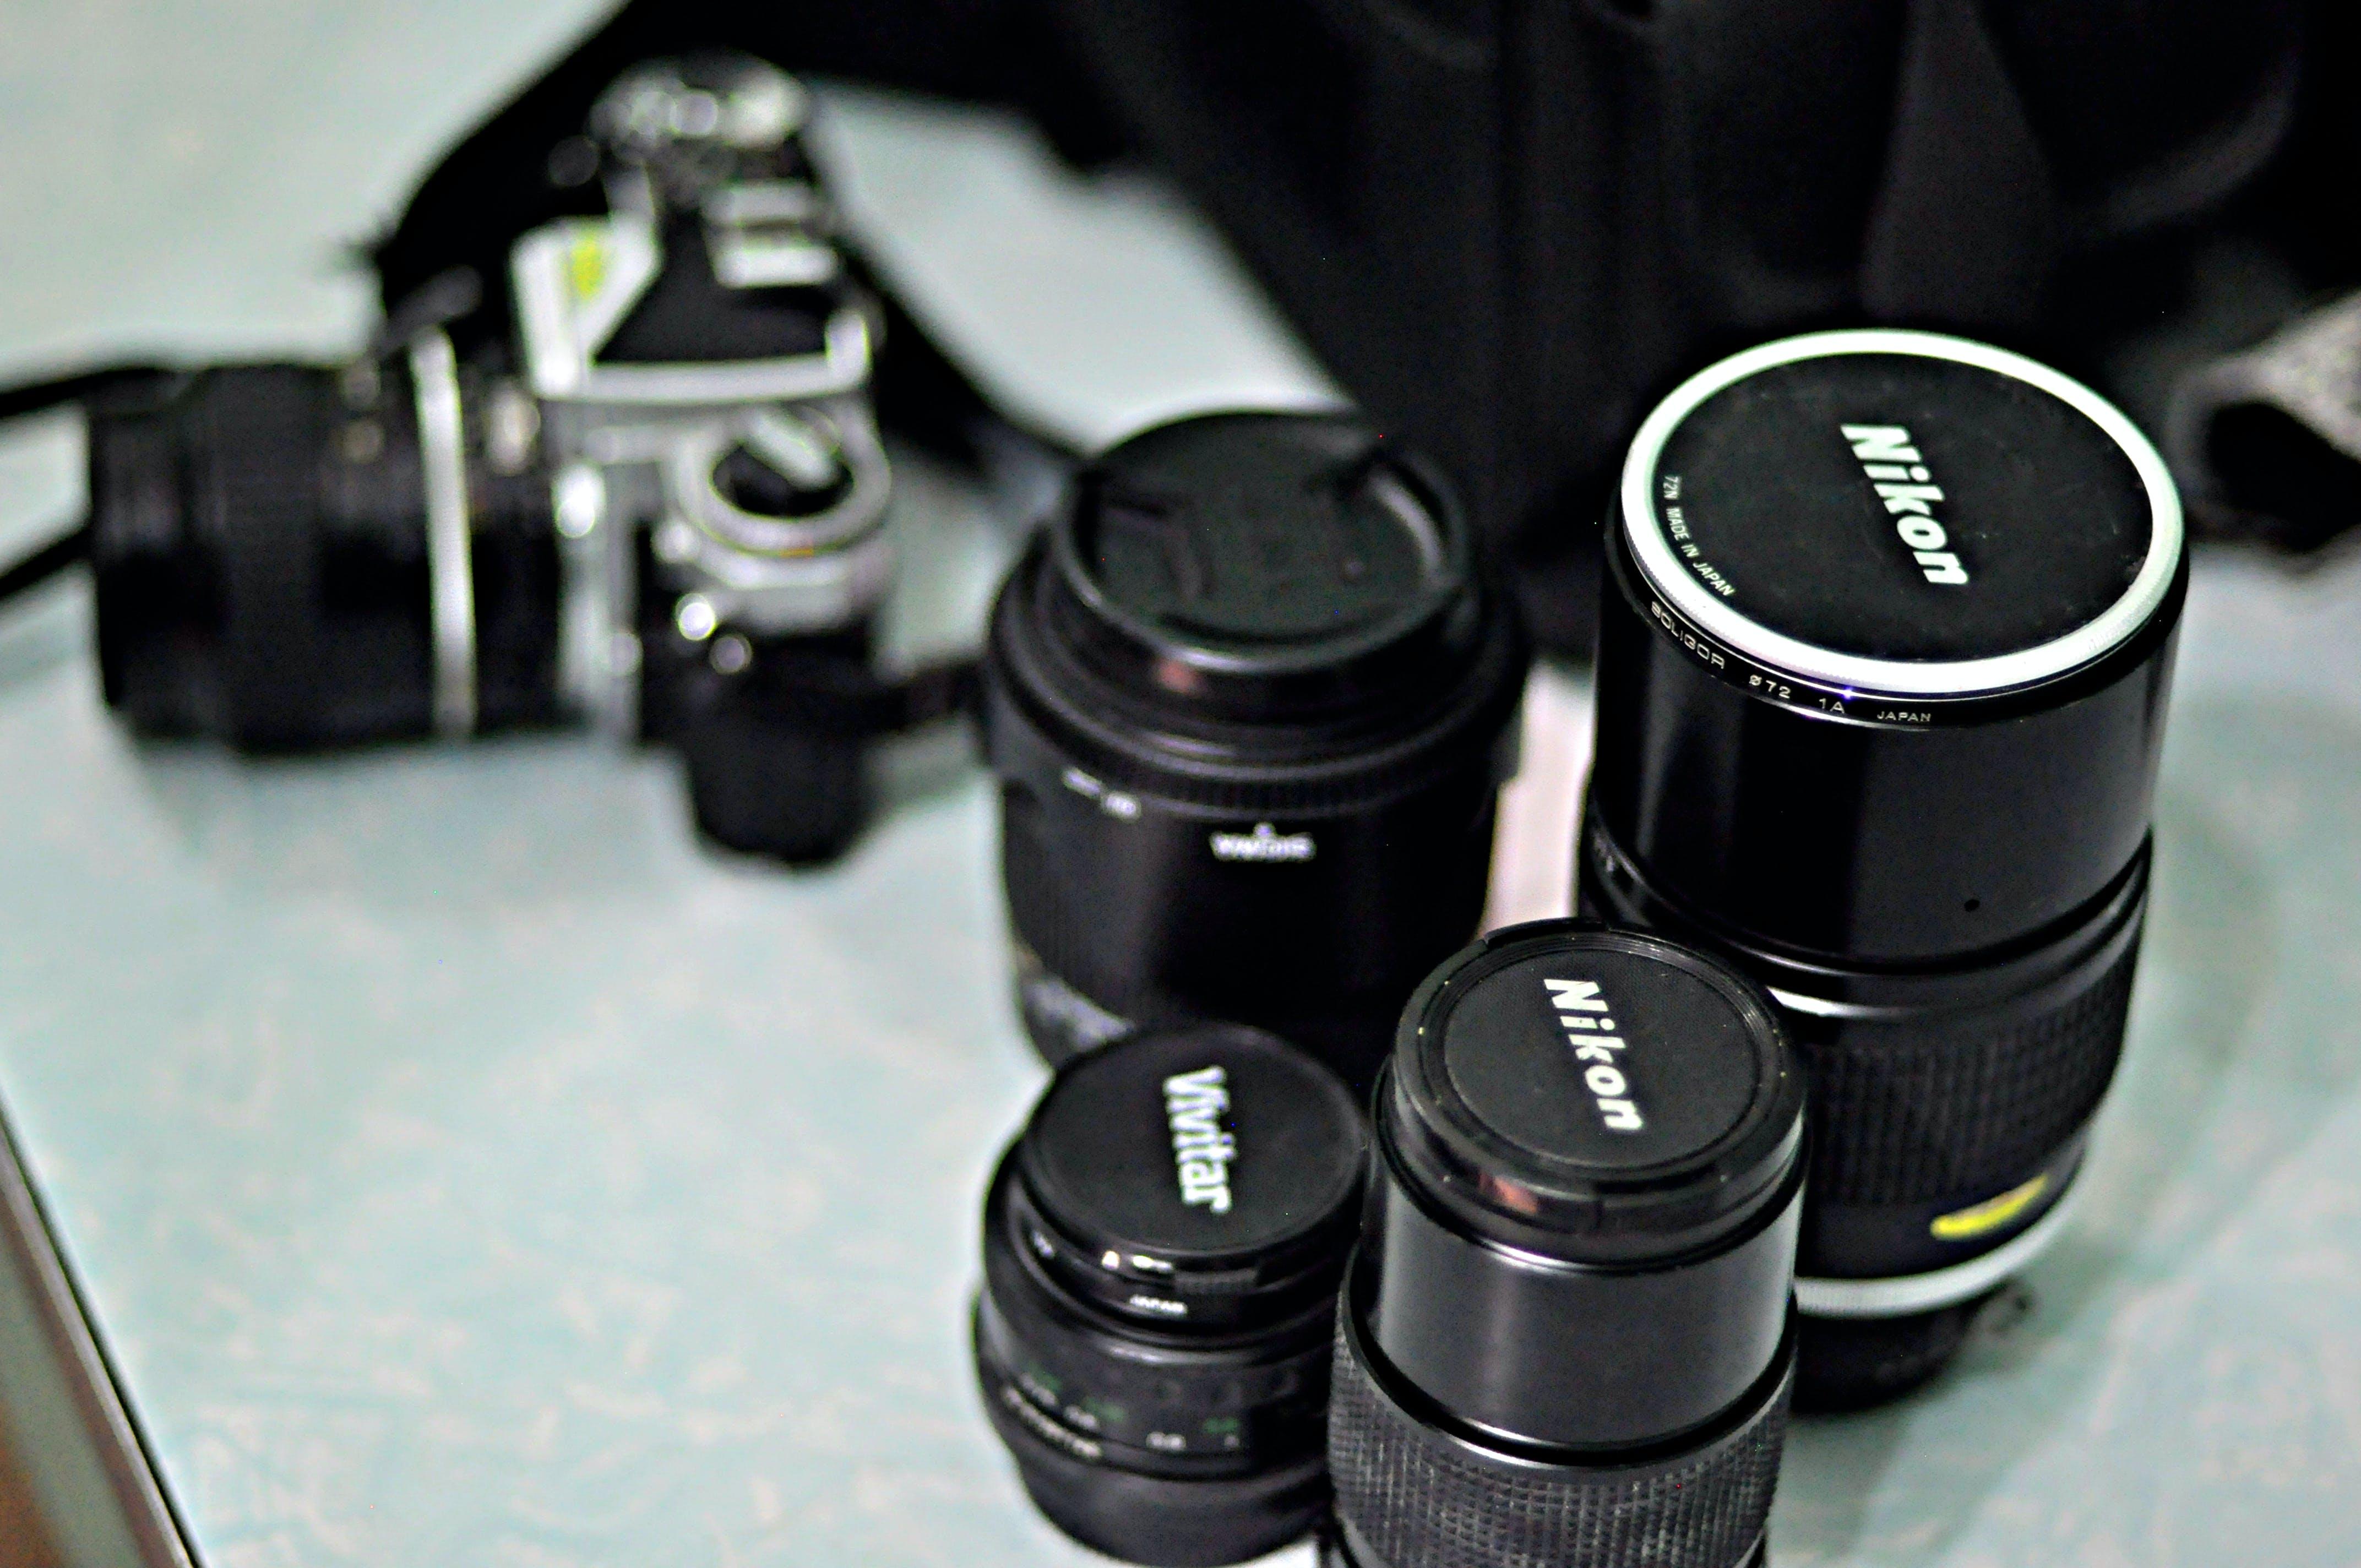 Four Black Nikon Zoom Camera Lens